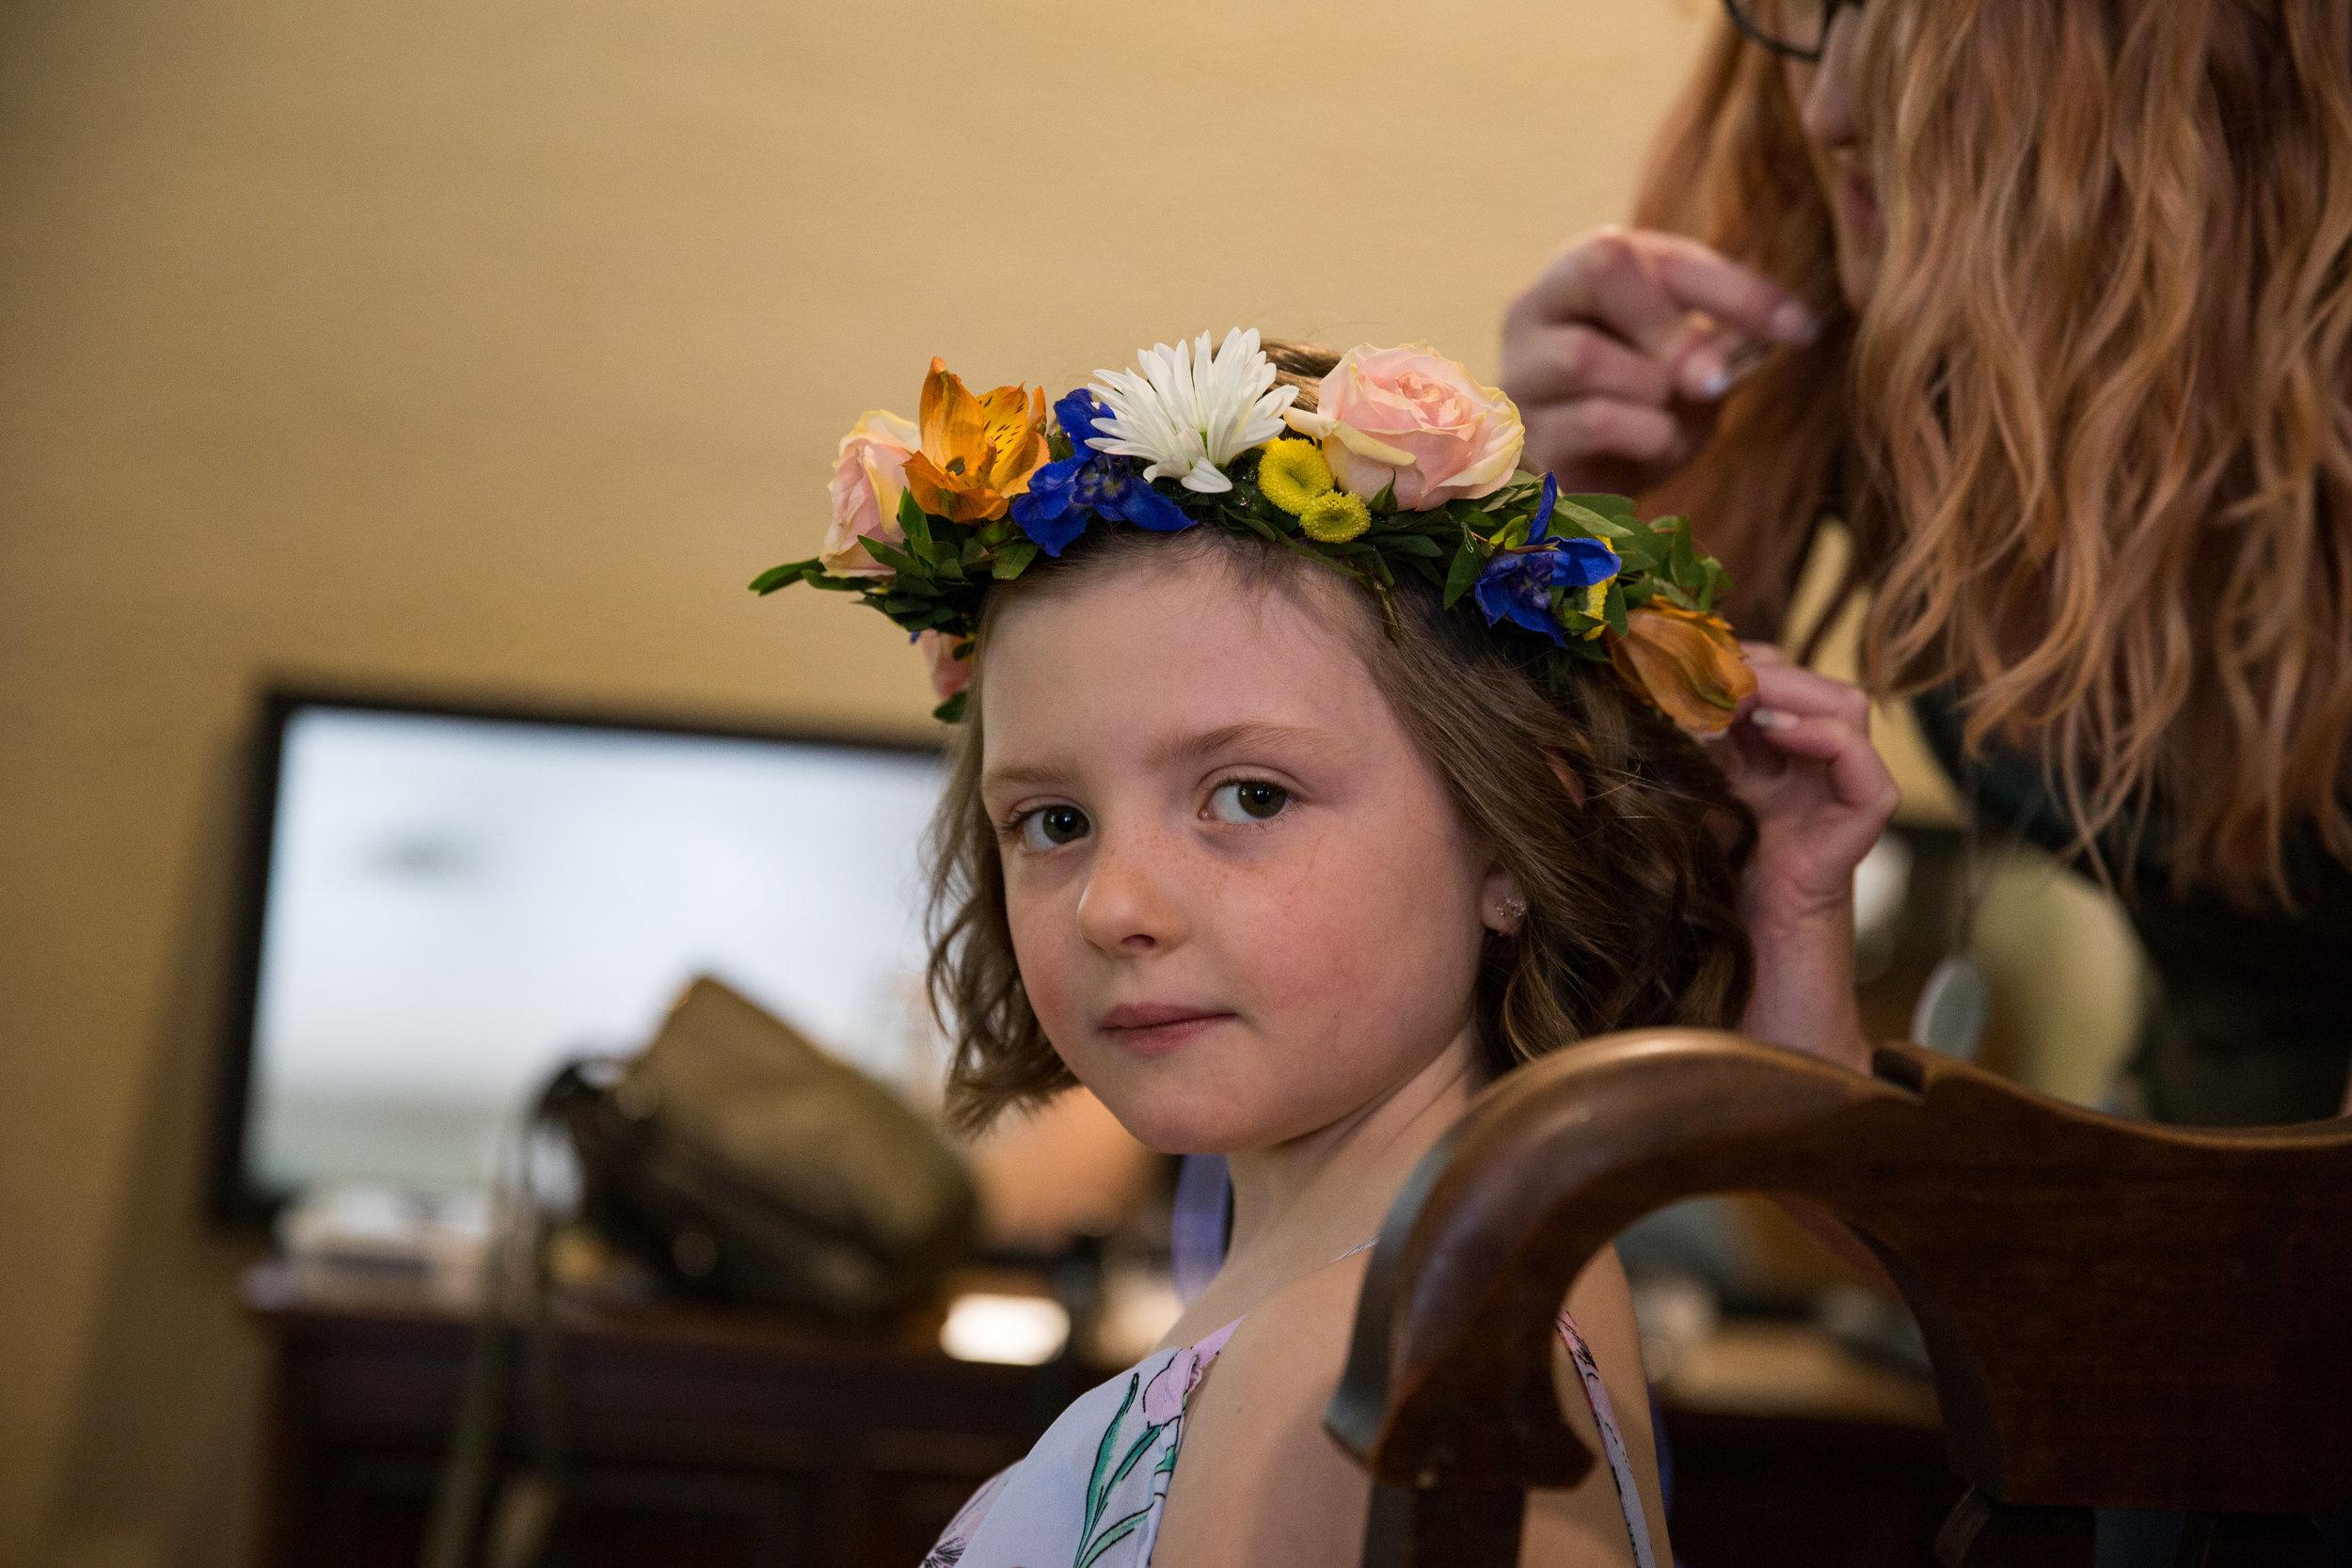 Natalie and Dallas Mooney Wedding 6-8-19_Tania Watt Photography-8.jpg